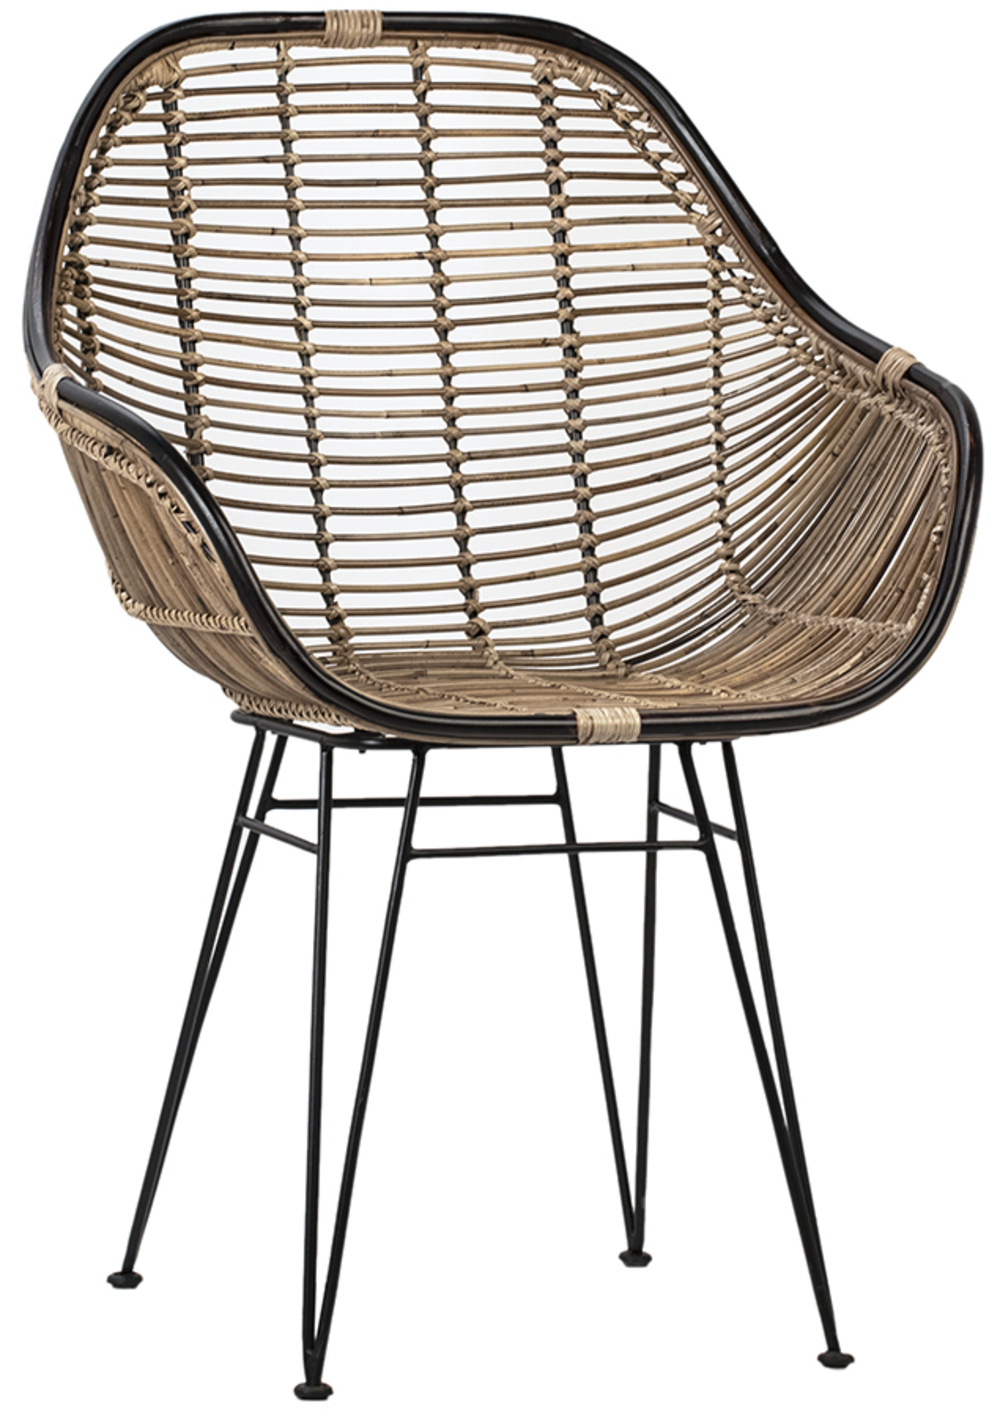 Dovetail Furniture - Salima Arm Chair